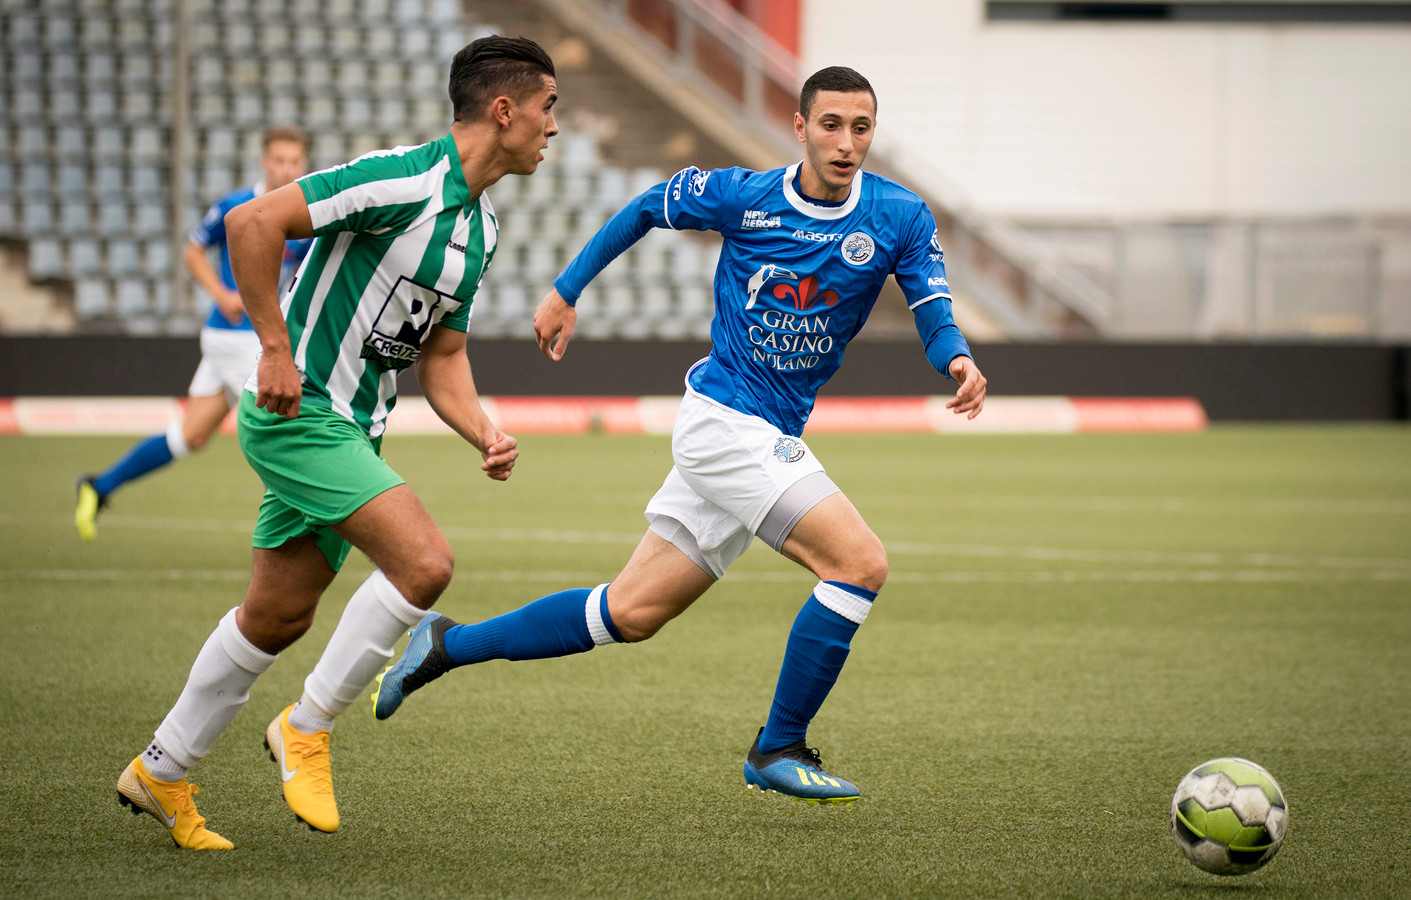 Den Bosch 08-09-2018  Jong FC Den Bosch - Achilles Veen  vlnr Ilias Zaimi en Omar Boulamhayam  Roy Lazet